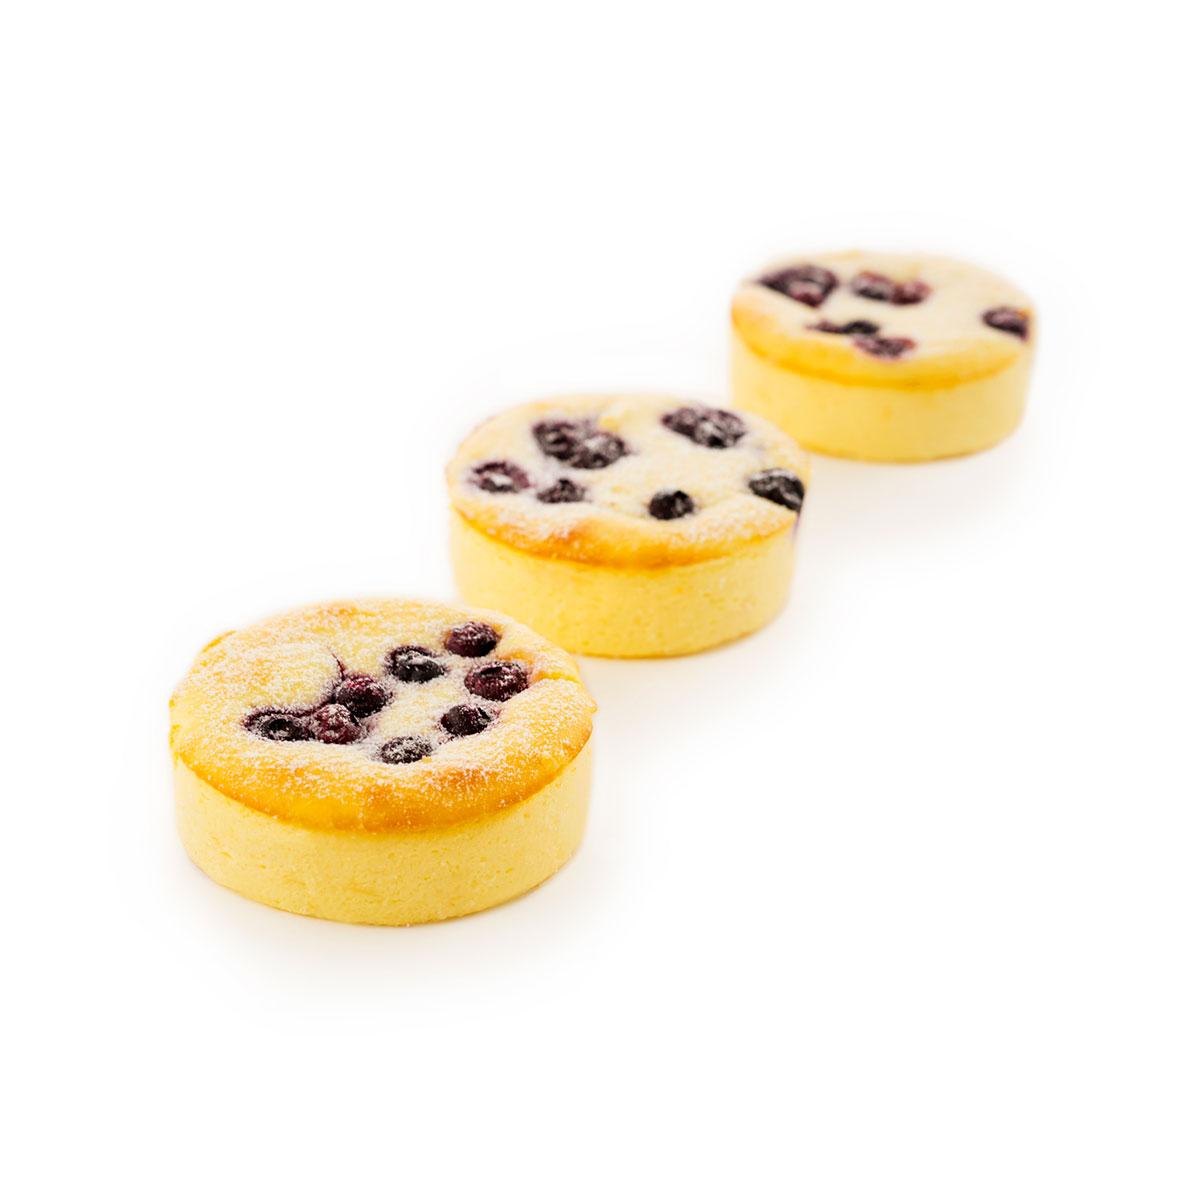 Blueberry Vanilla Cheesecake